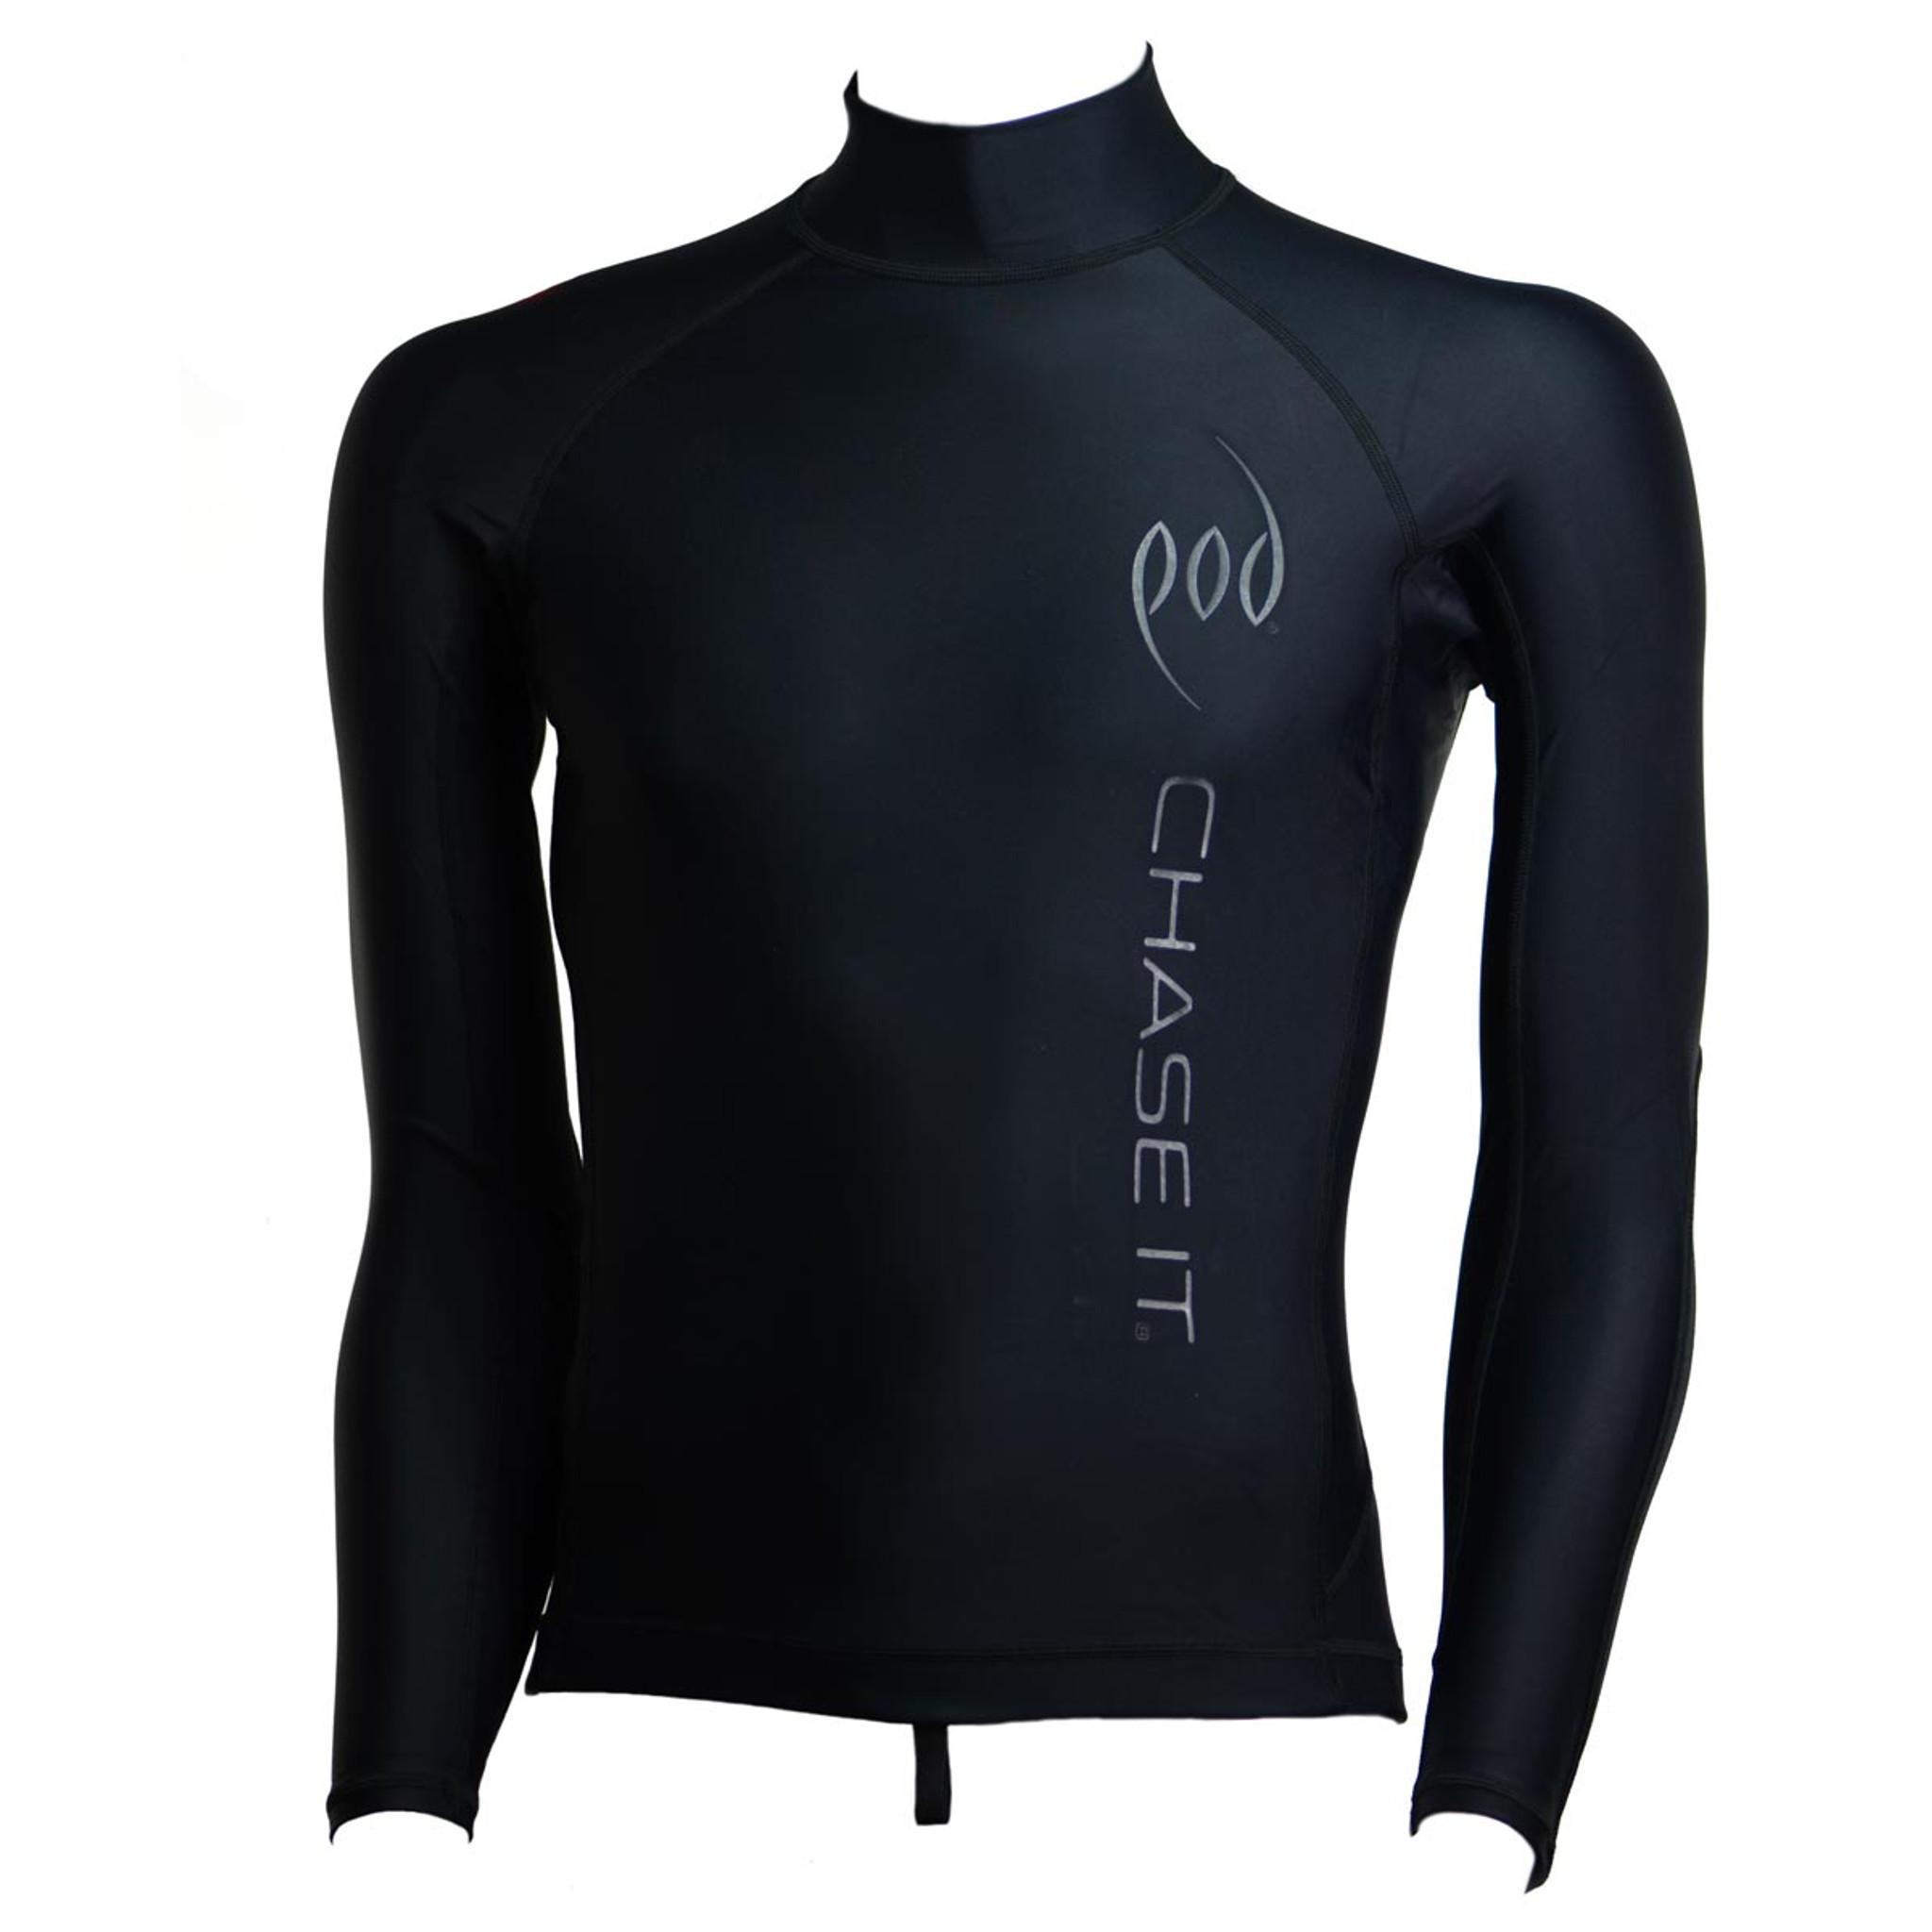 POD Fins PF1 - Rash Shirt – Long Sleeve Rash Vest